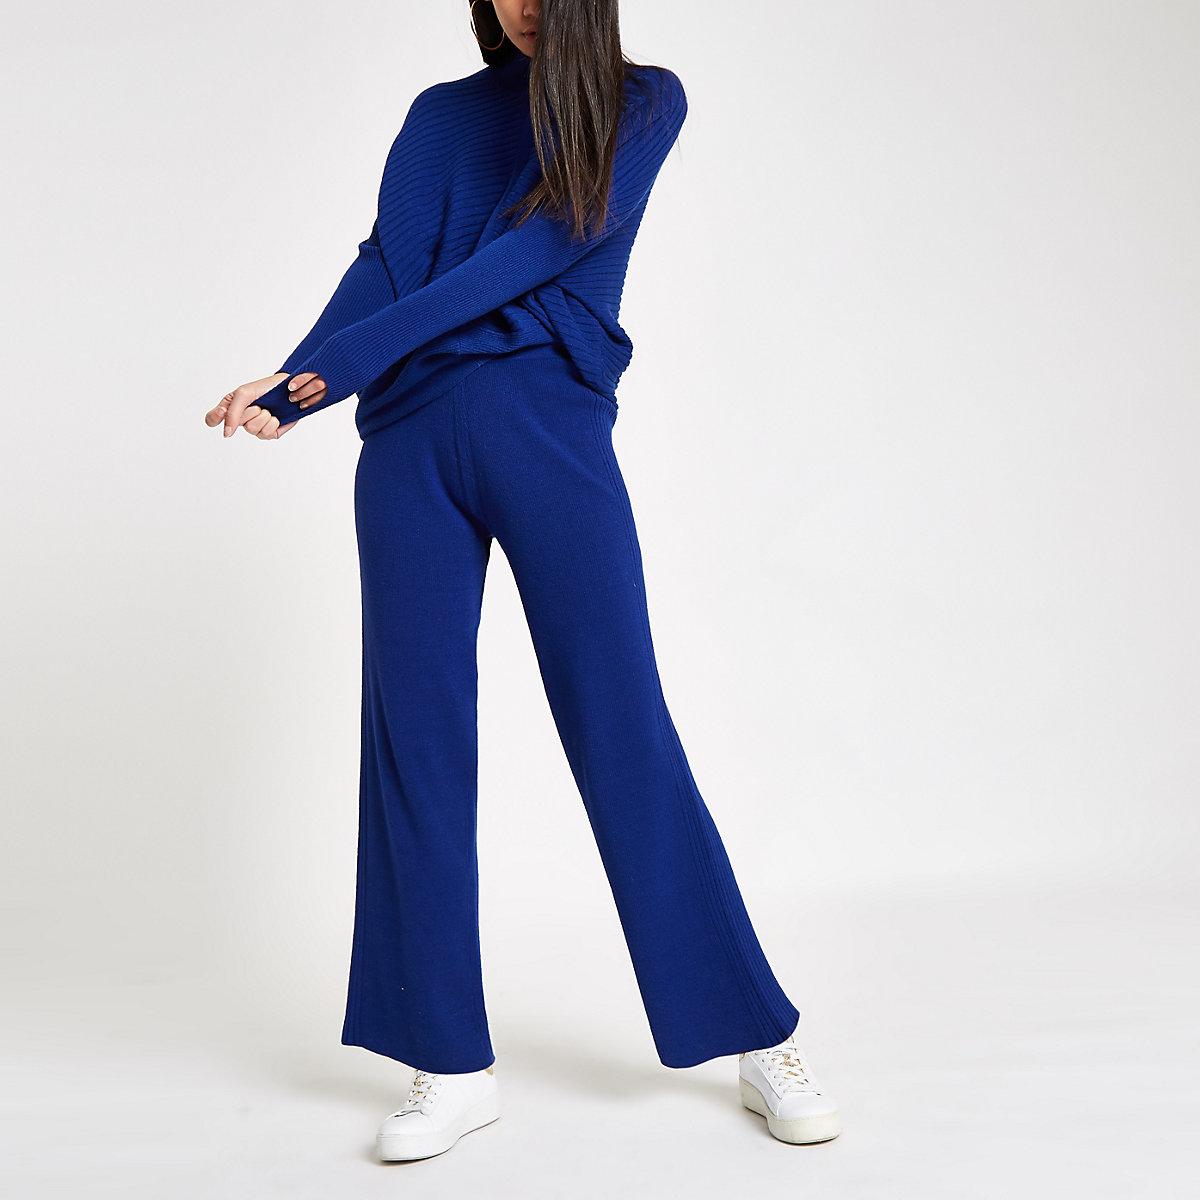 Blue knit wide leg pants